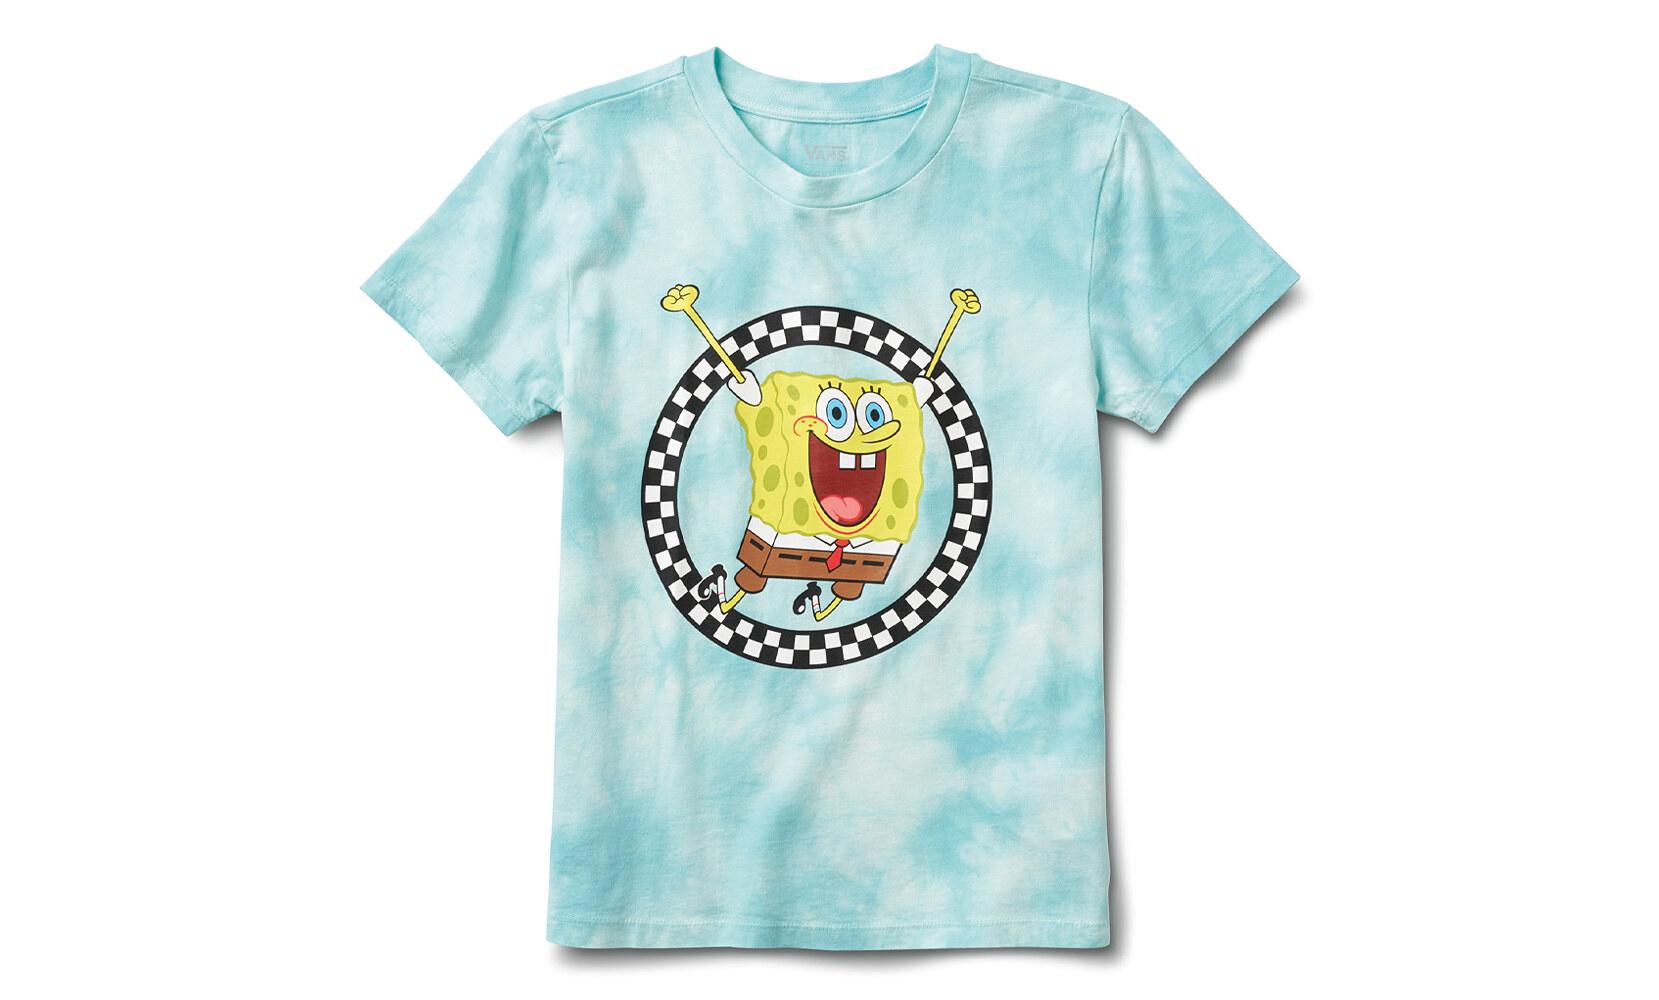 Vans x Nickelodeon SpongeBob Square Pants